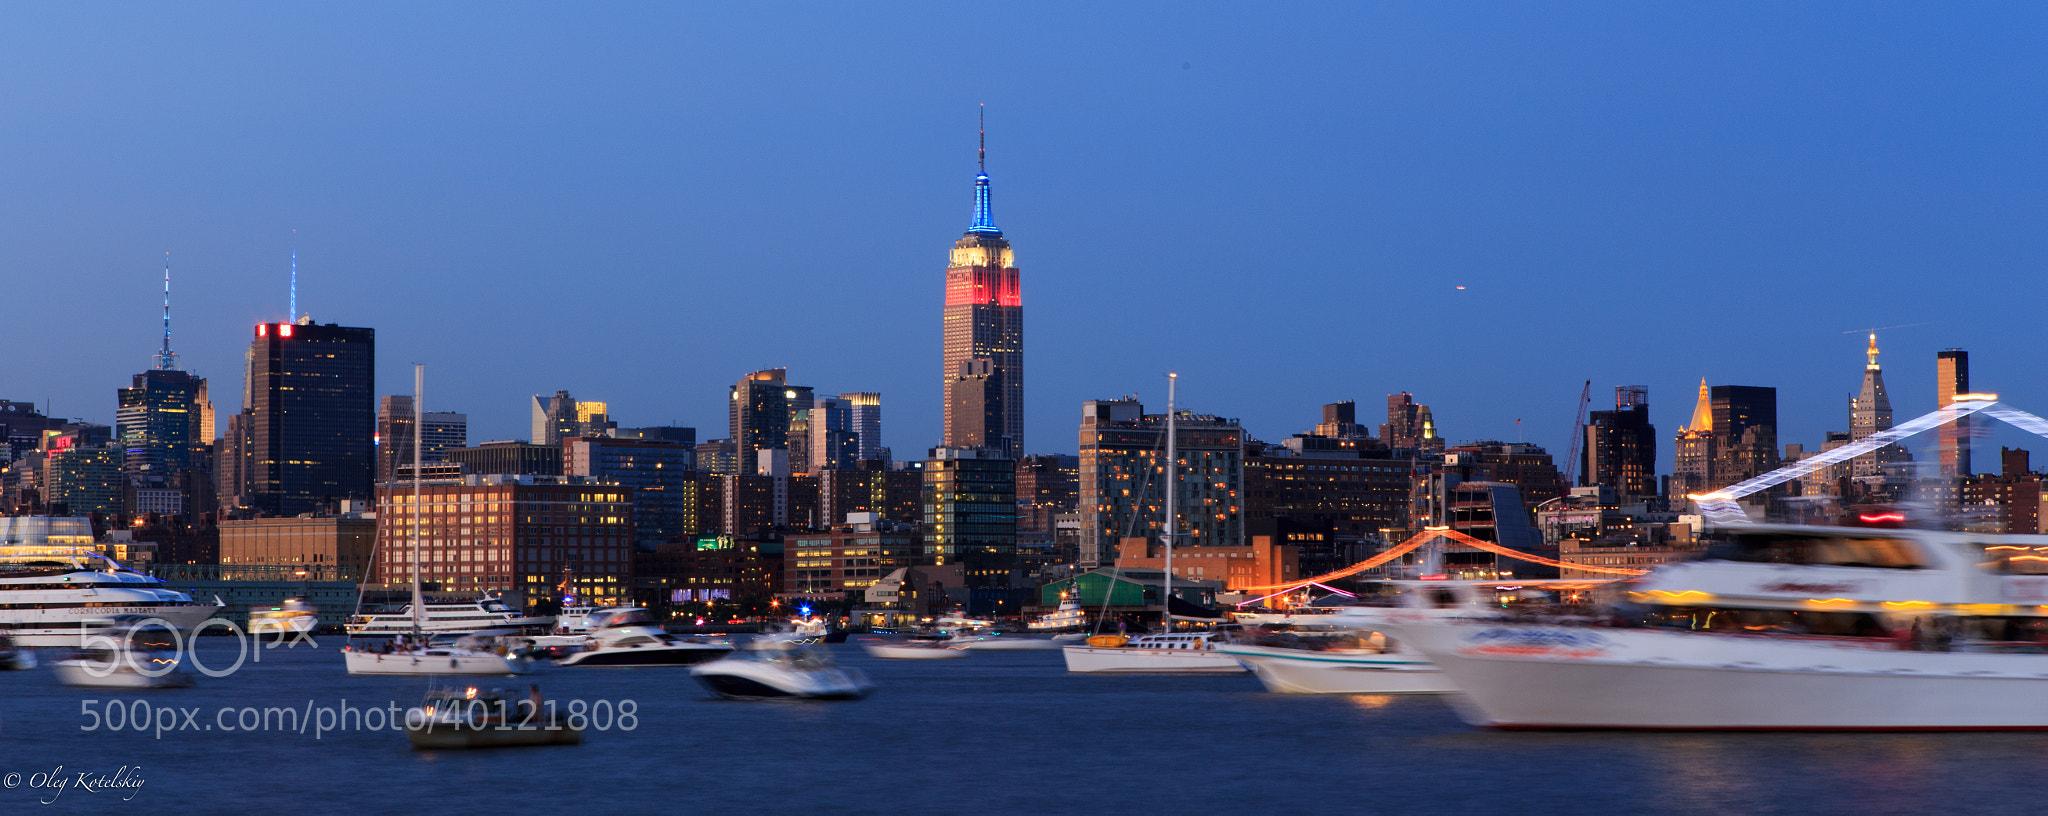 Photograph July 4th Manhattan by Oleg Kotelskiy on 500px